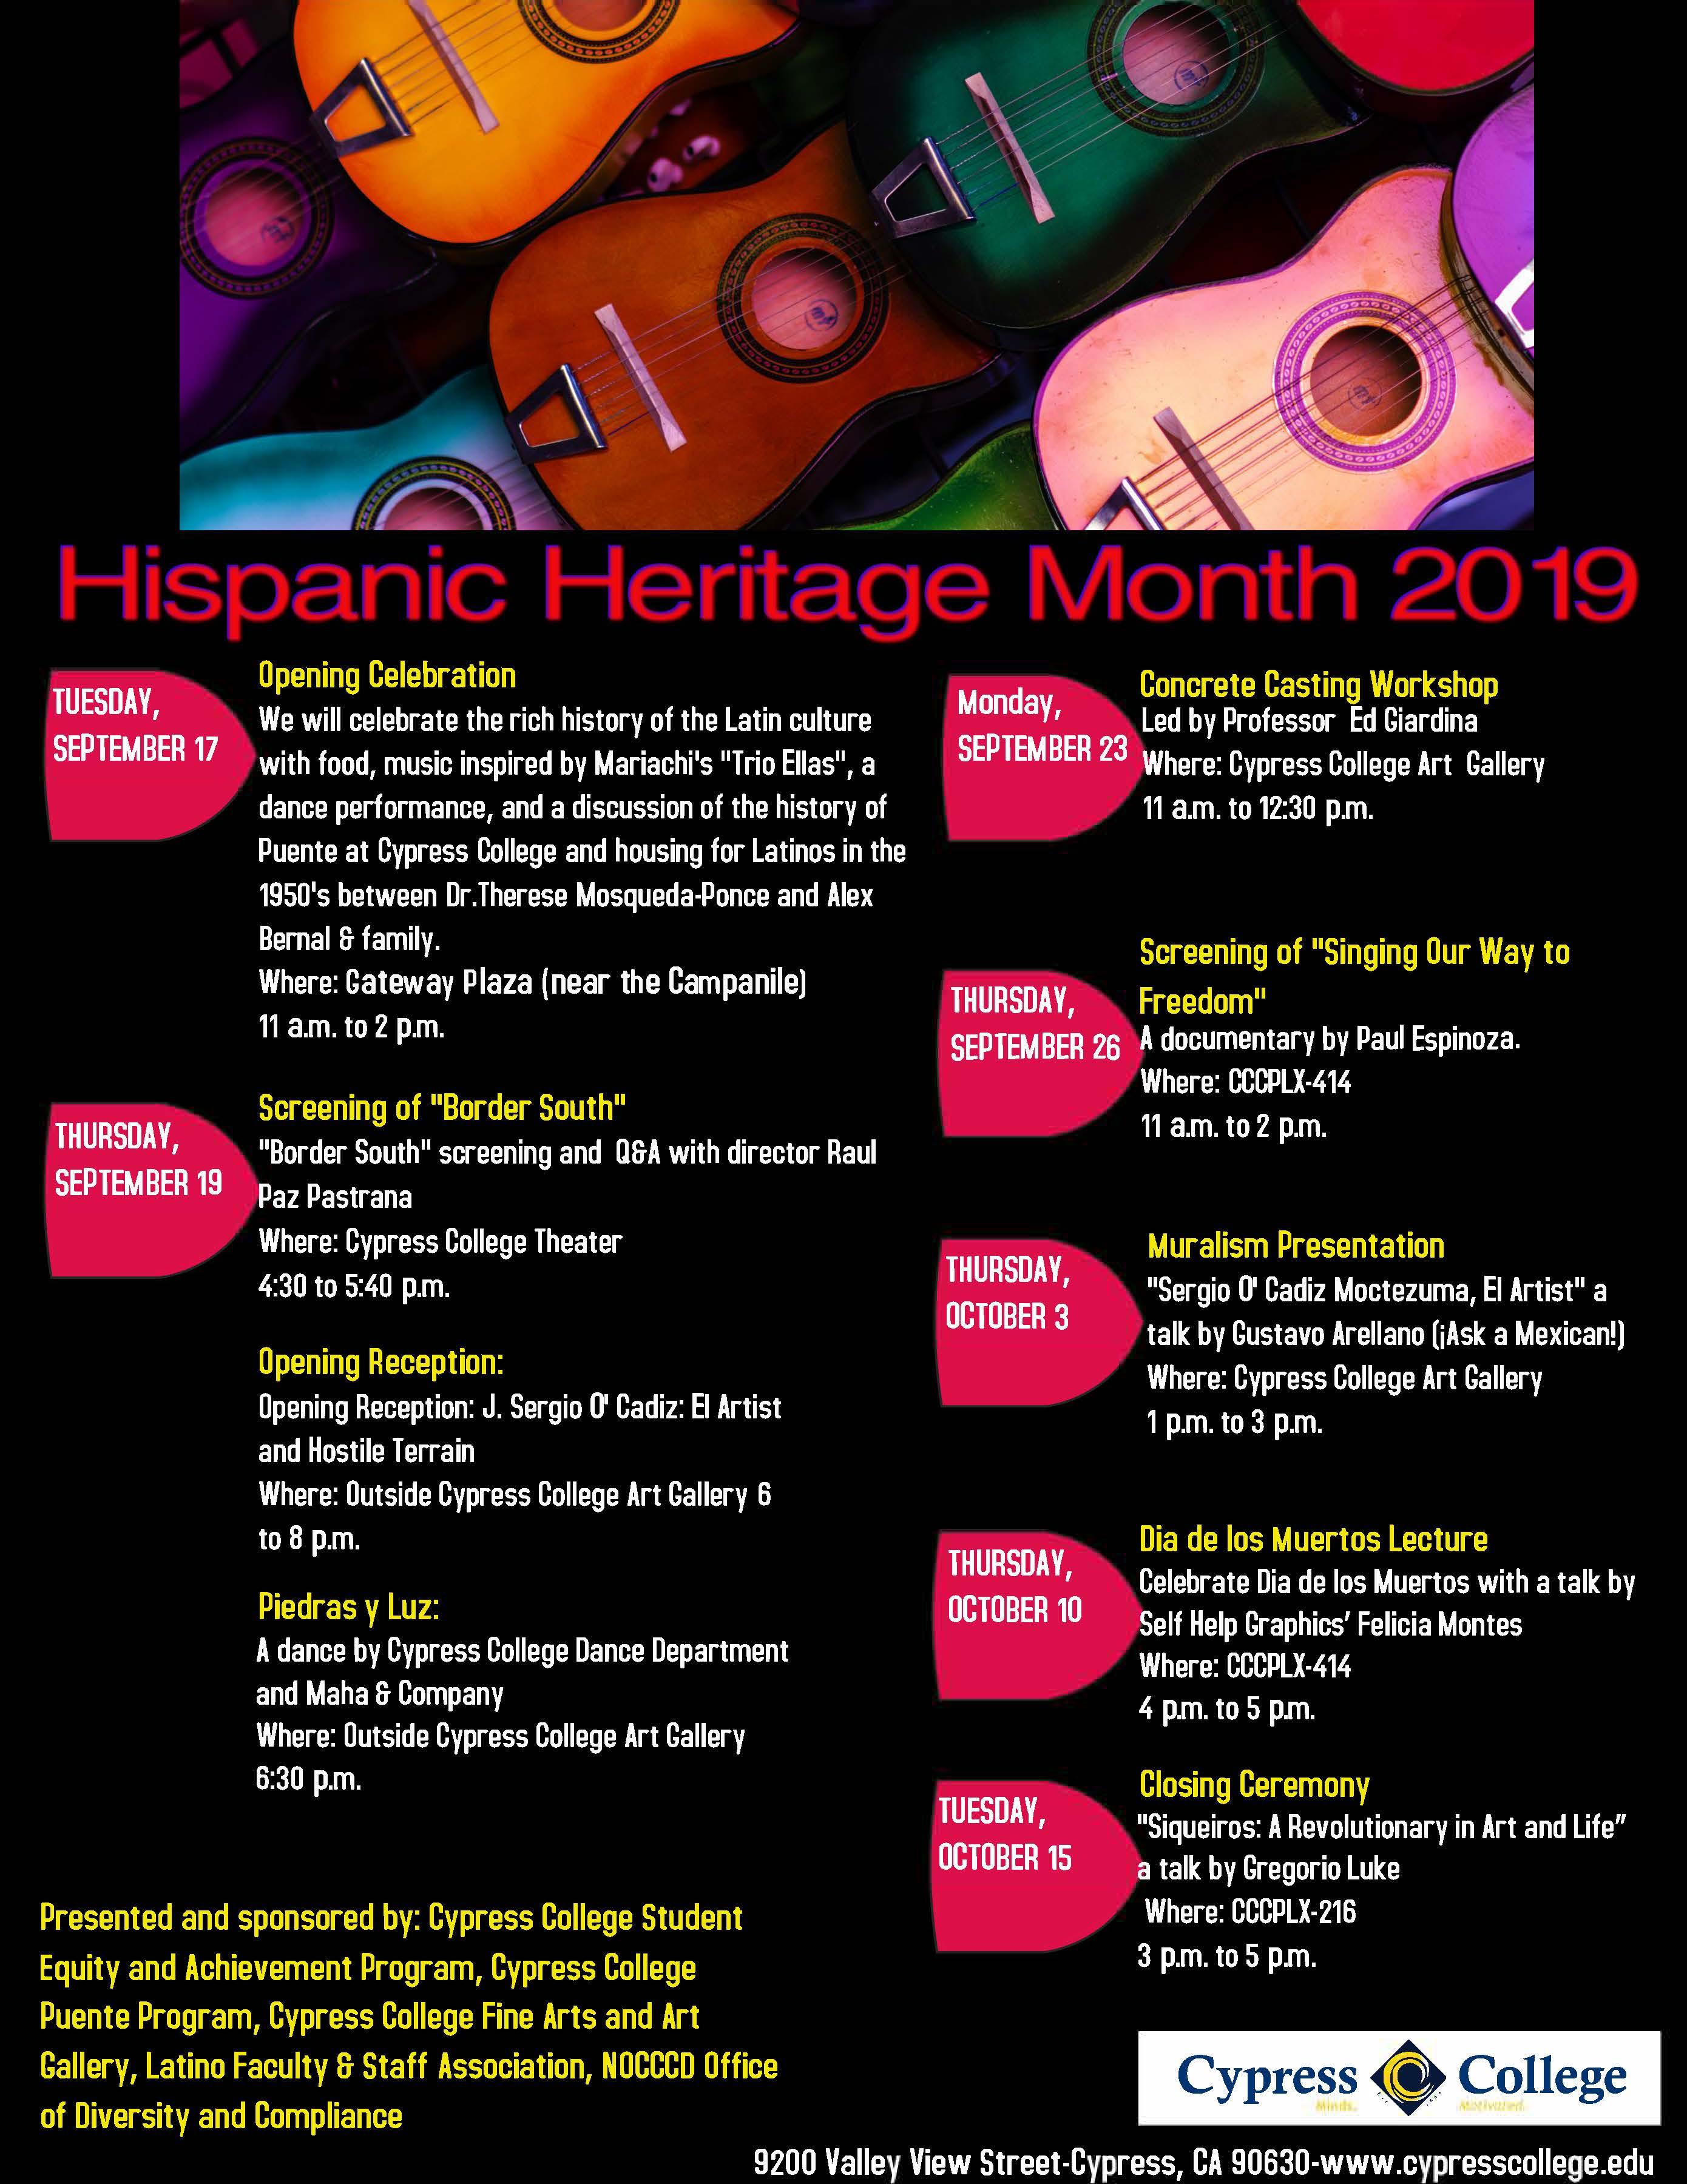 2019 Hispanic Heritage Month events